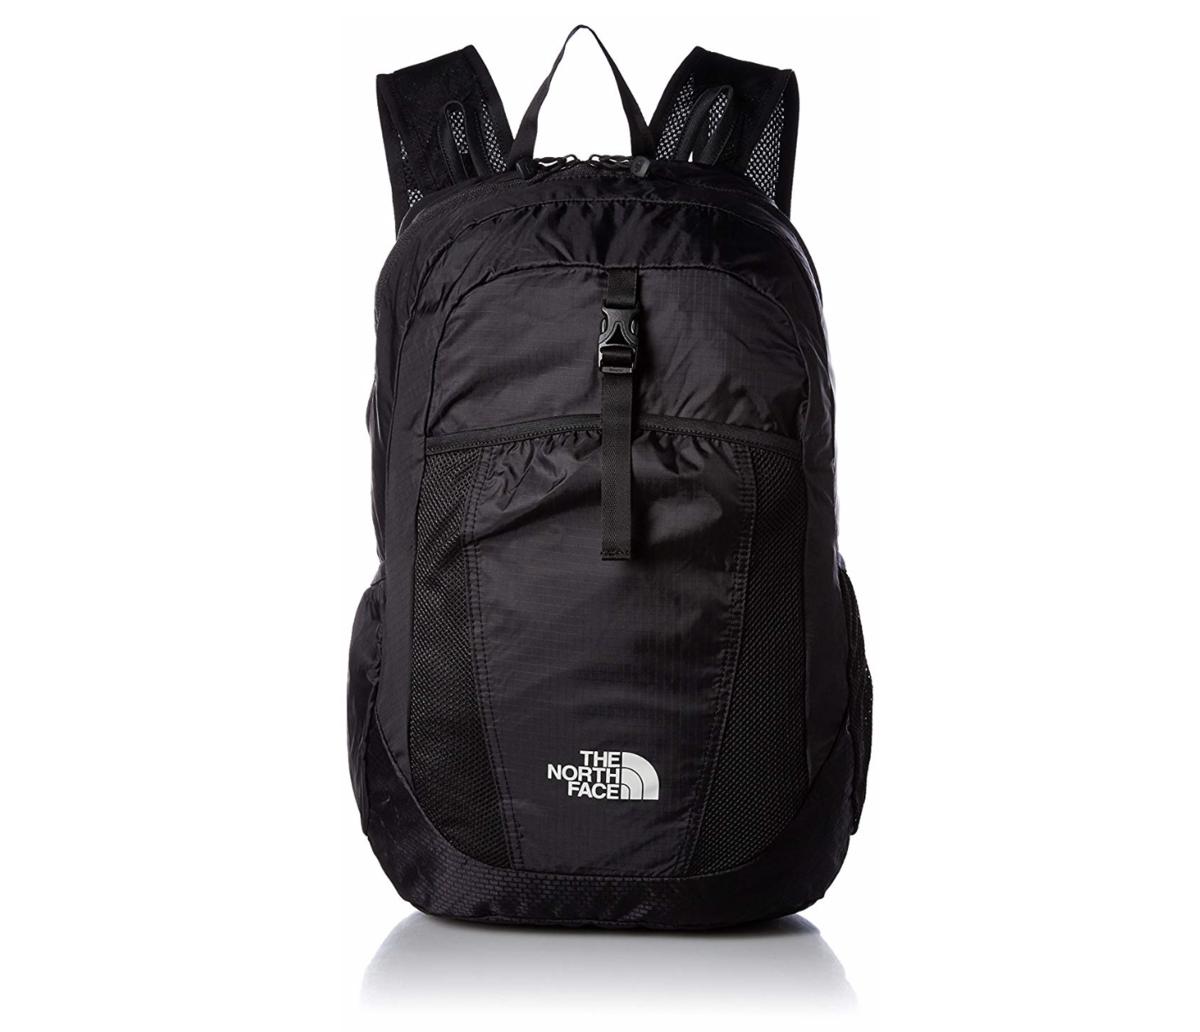 f:id:thebackpack:20190406093408p:plain